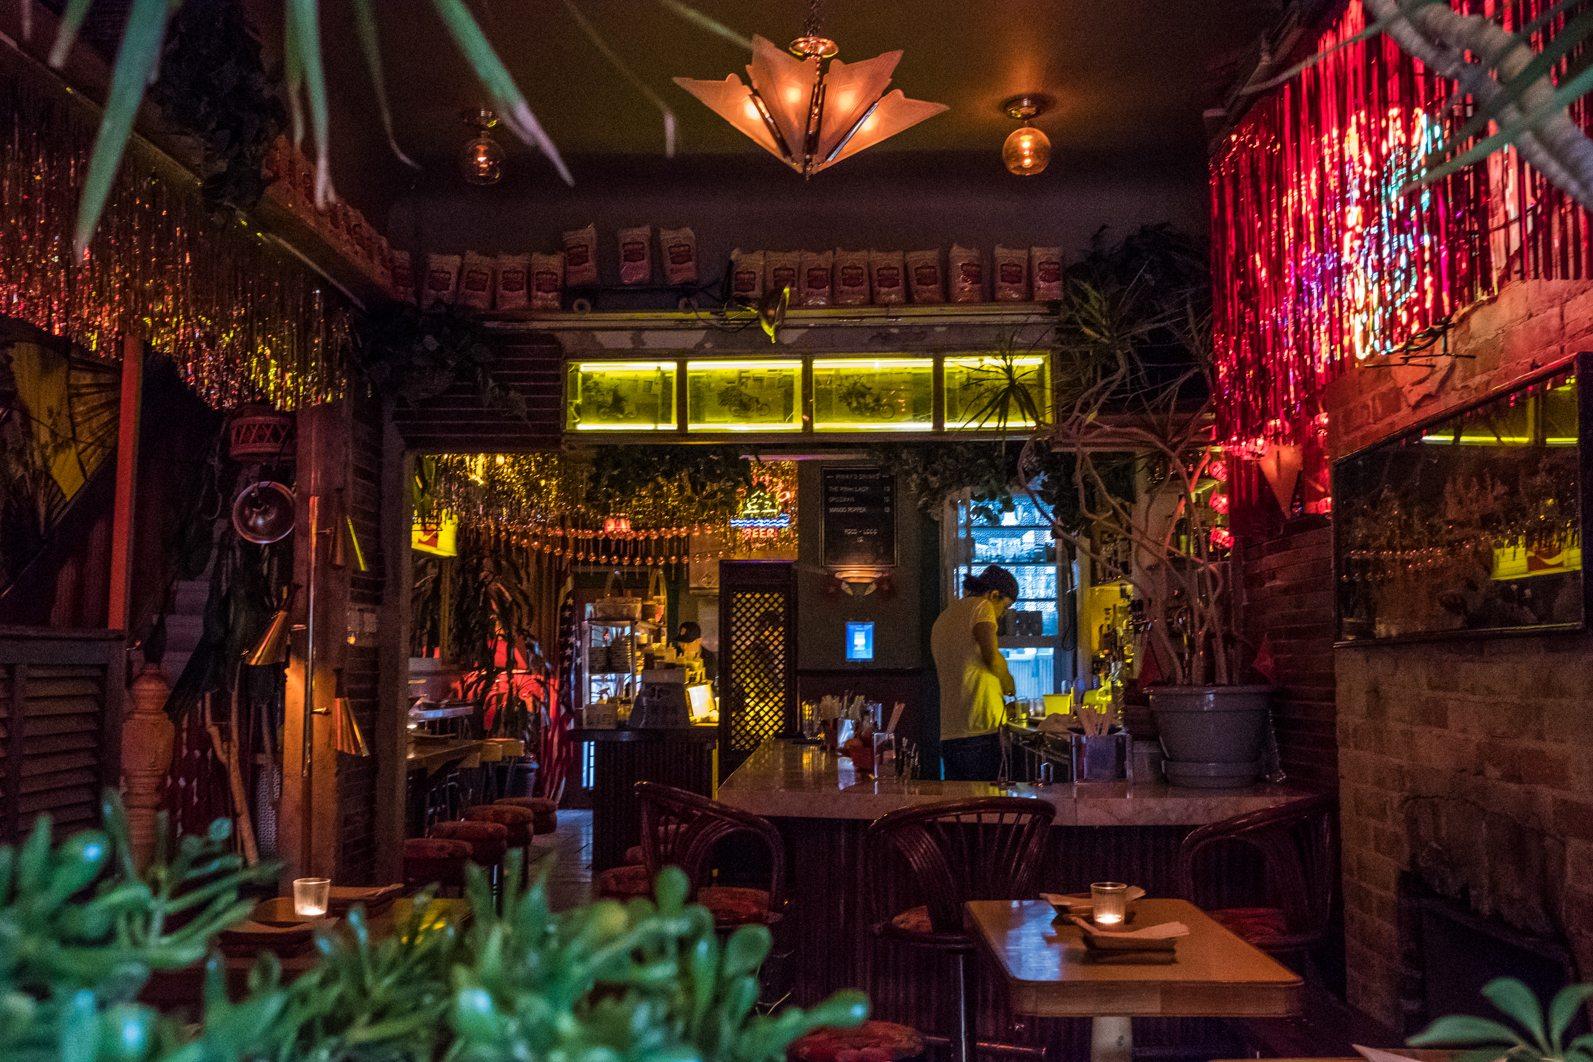 toronto-restaurants-pinkys-ca-phe-vietnamese-cambodian-snack-bar-little-italy-room-2